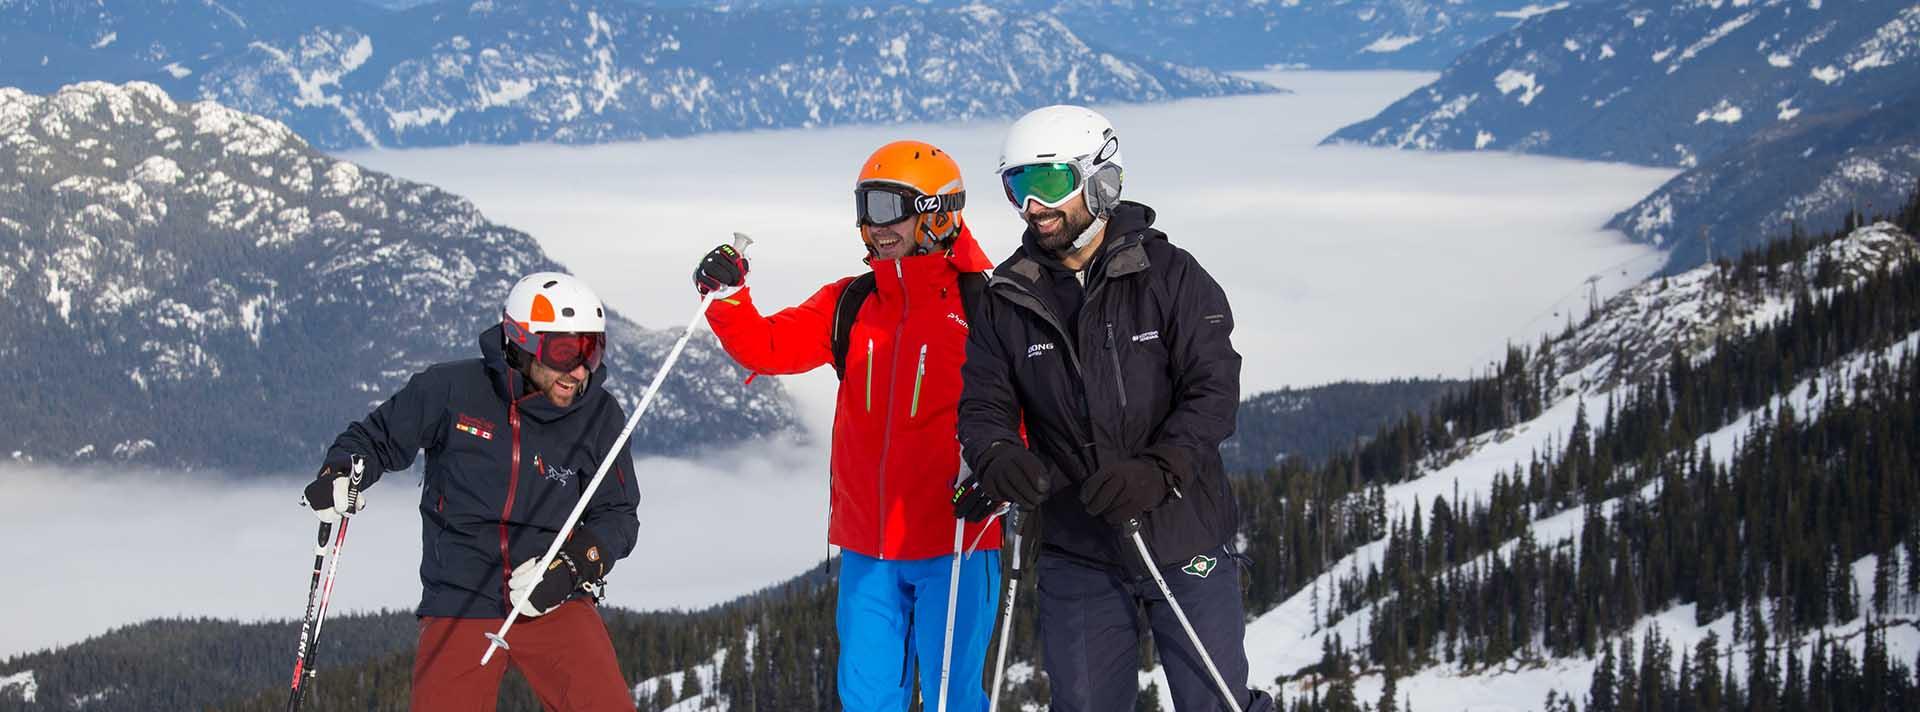 Canada Ski Experience life